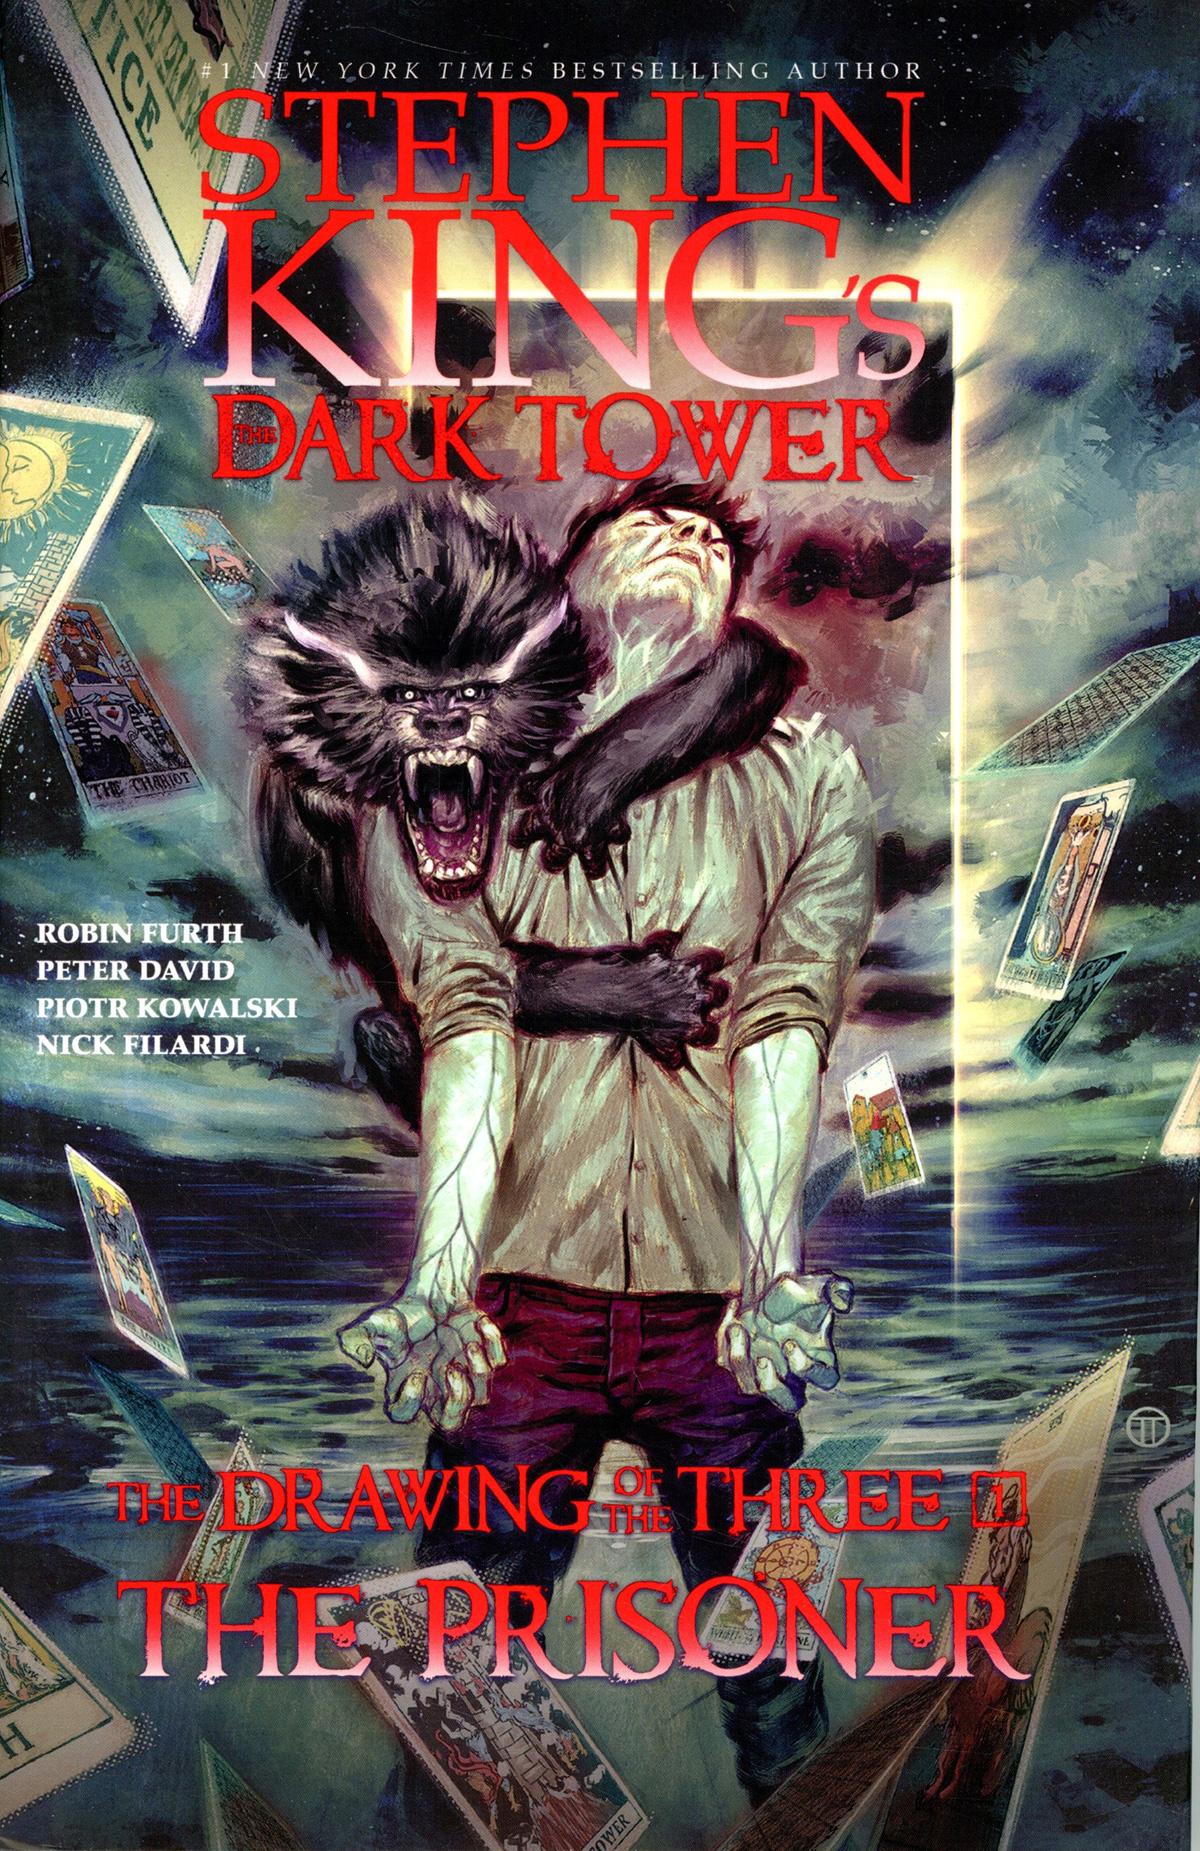 Dark Tower Drawing Of Three Vol 1 The Prisoner HC